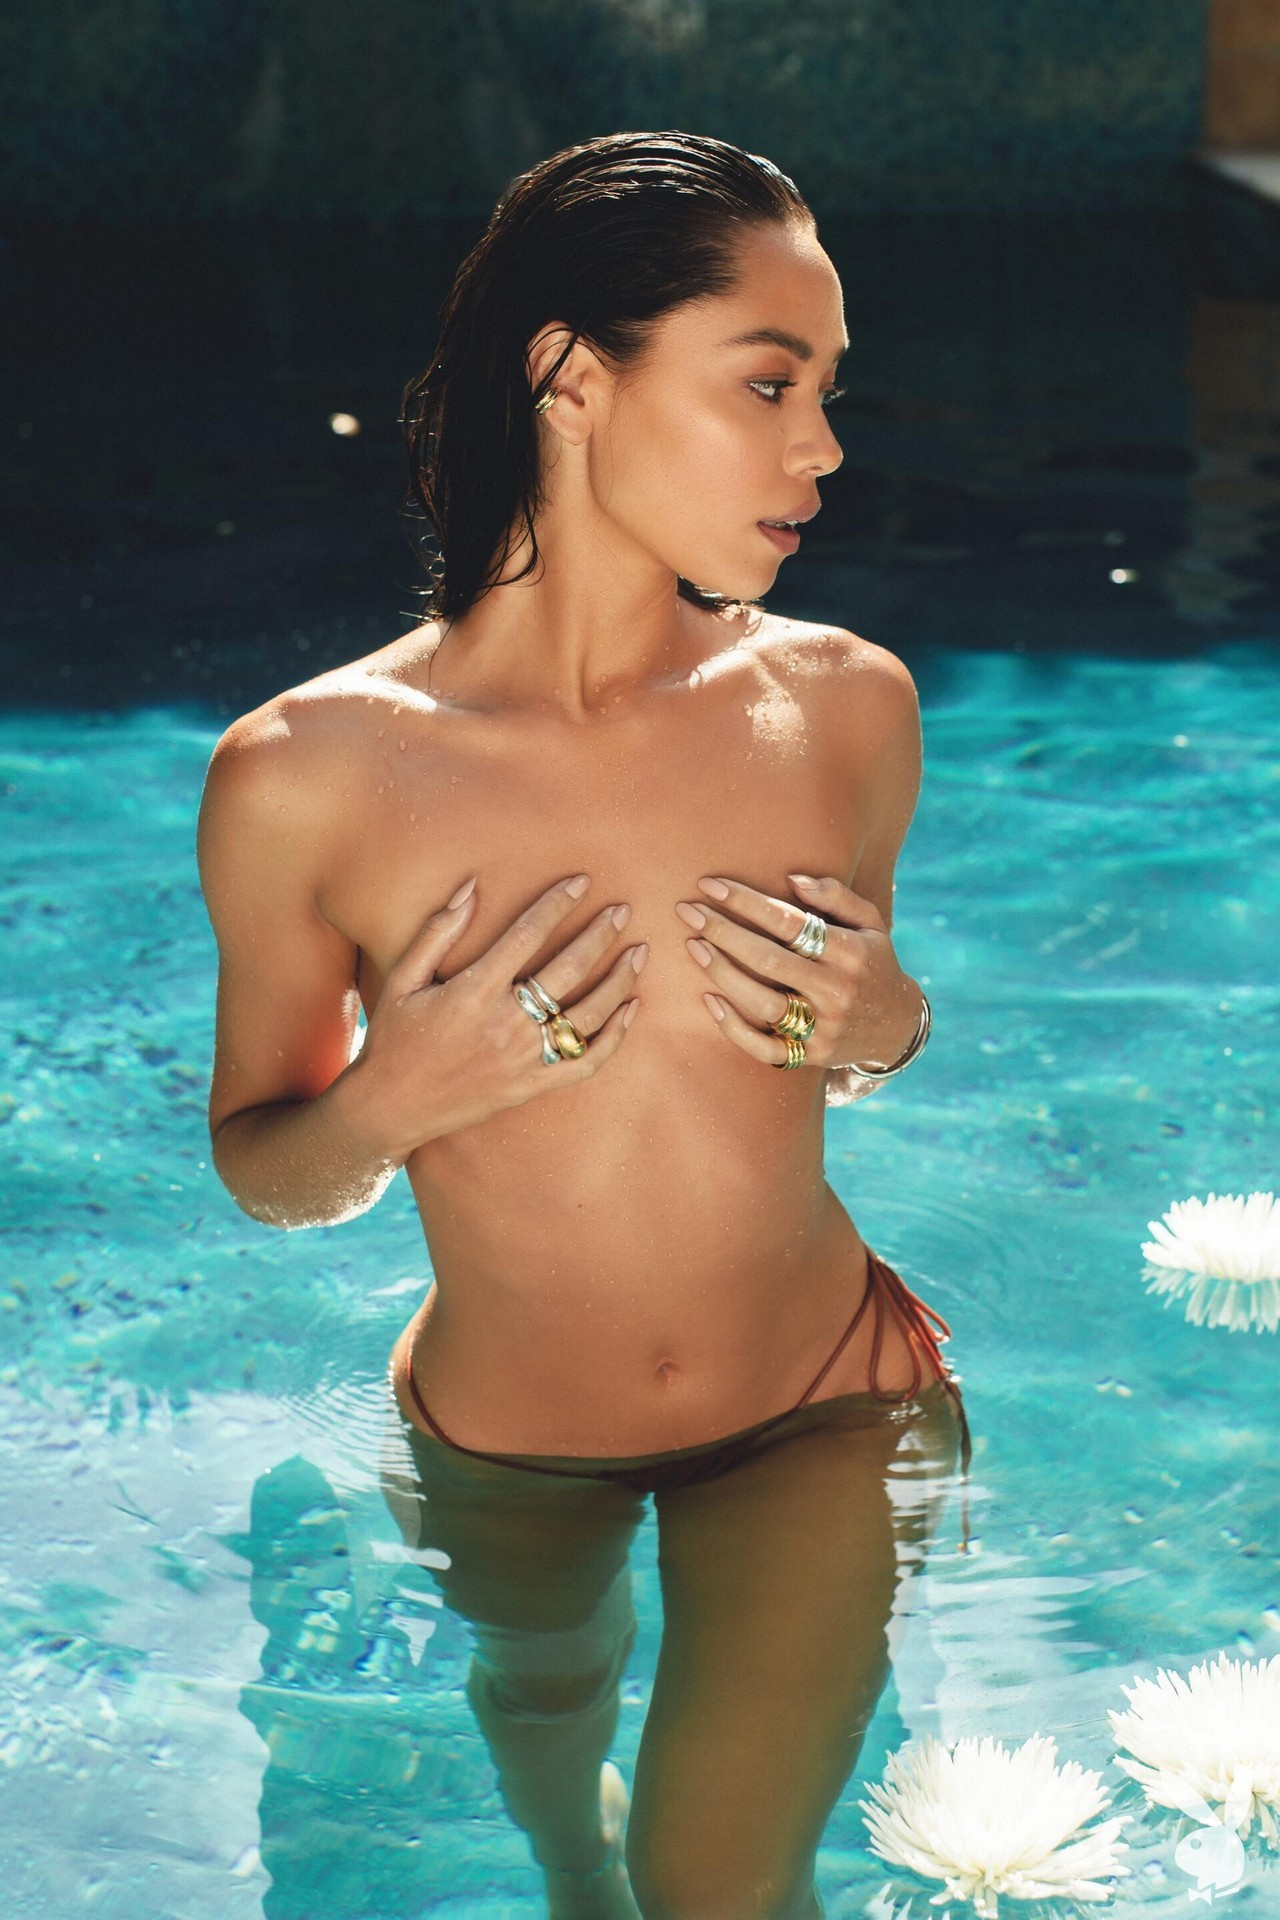 Playmate September 2020 Danielle Alcaraz Playboy Plus (40)